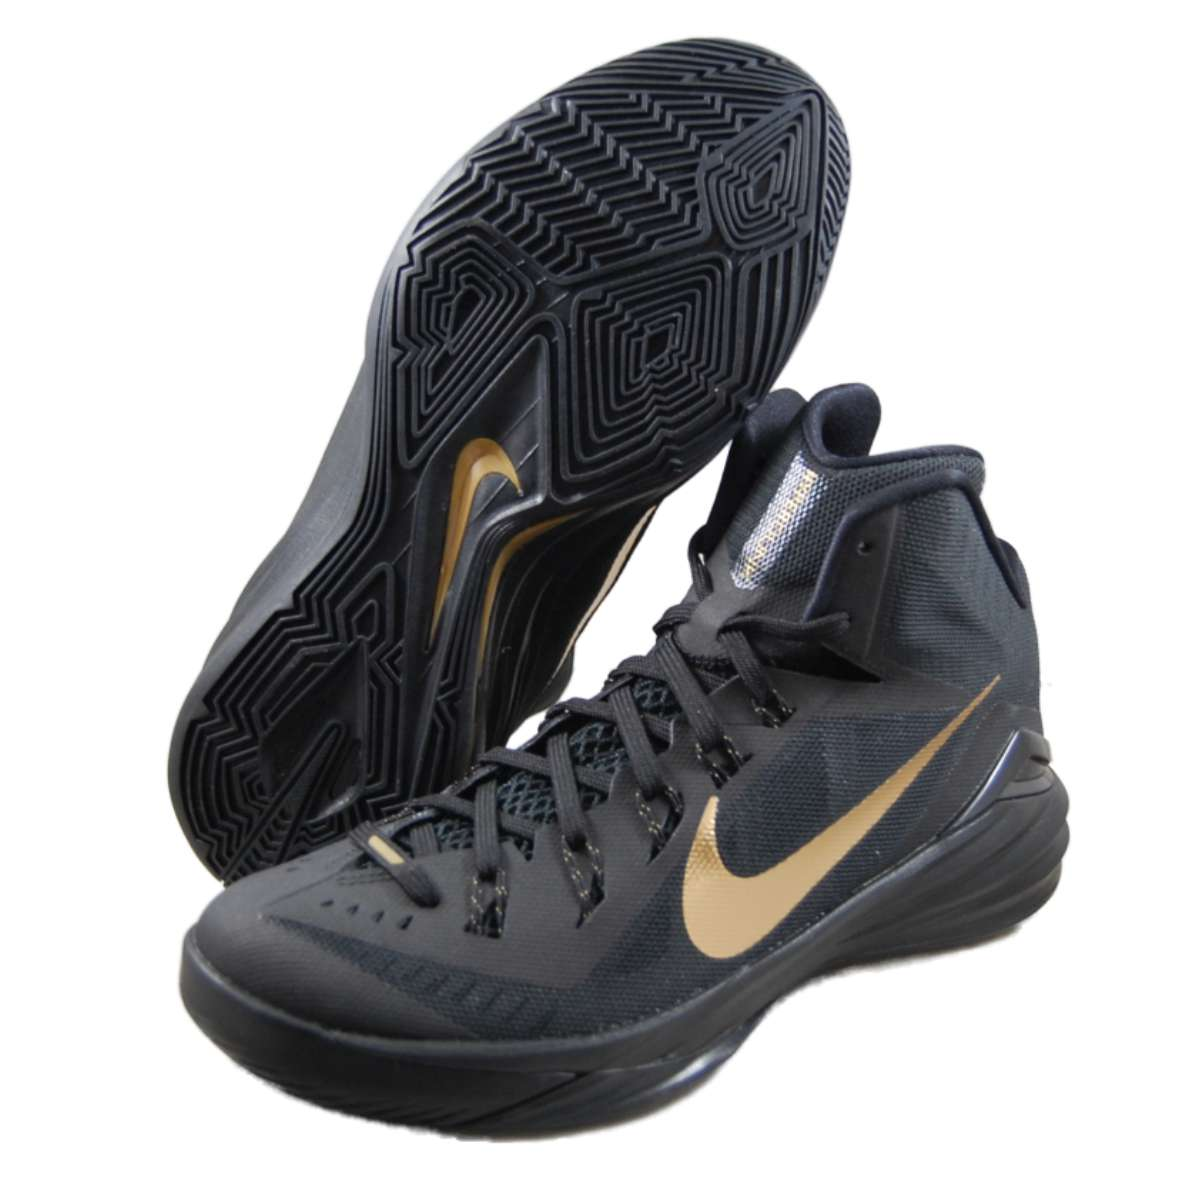 Nike Mens Hyperdunk 2014 Black basketball-shoes 653640-071 ...  Nike Mens Hyper...